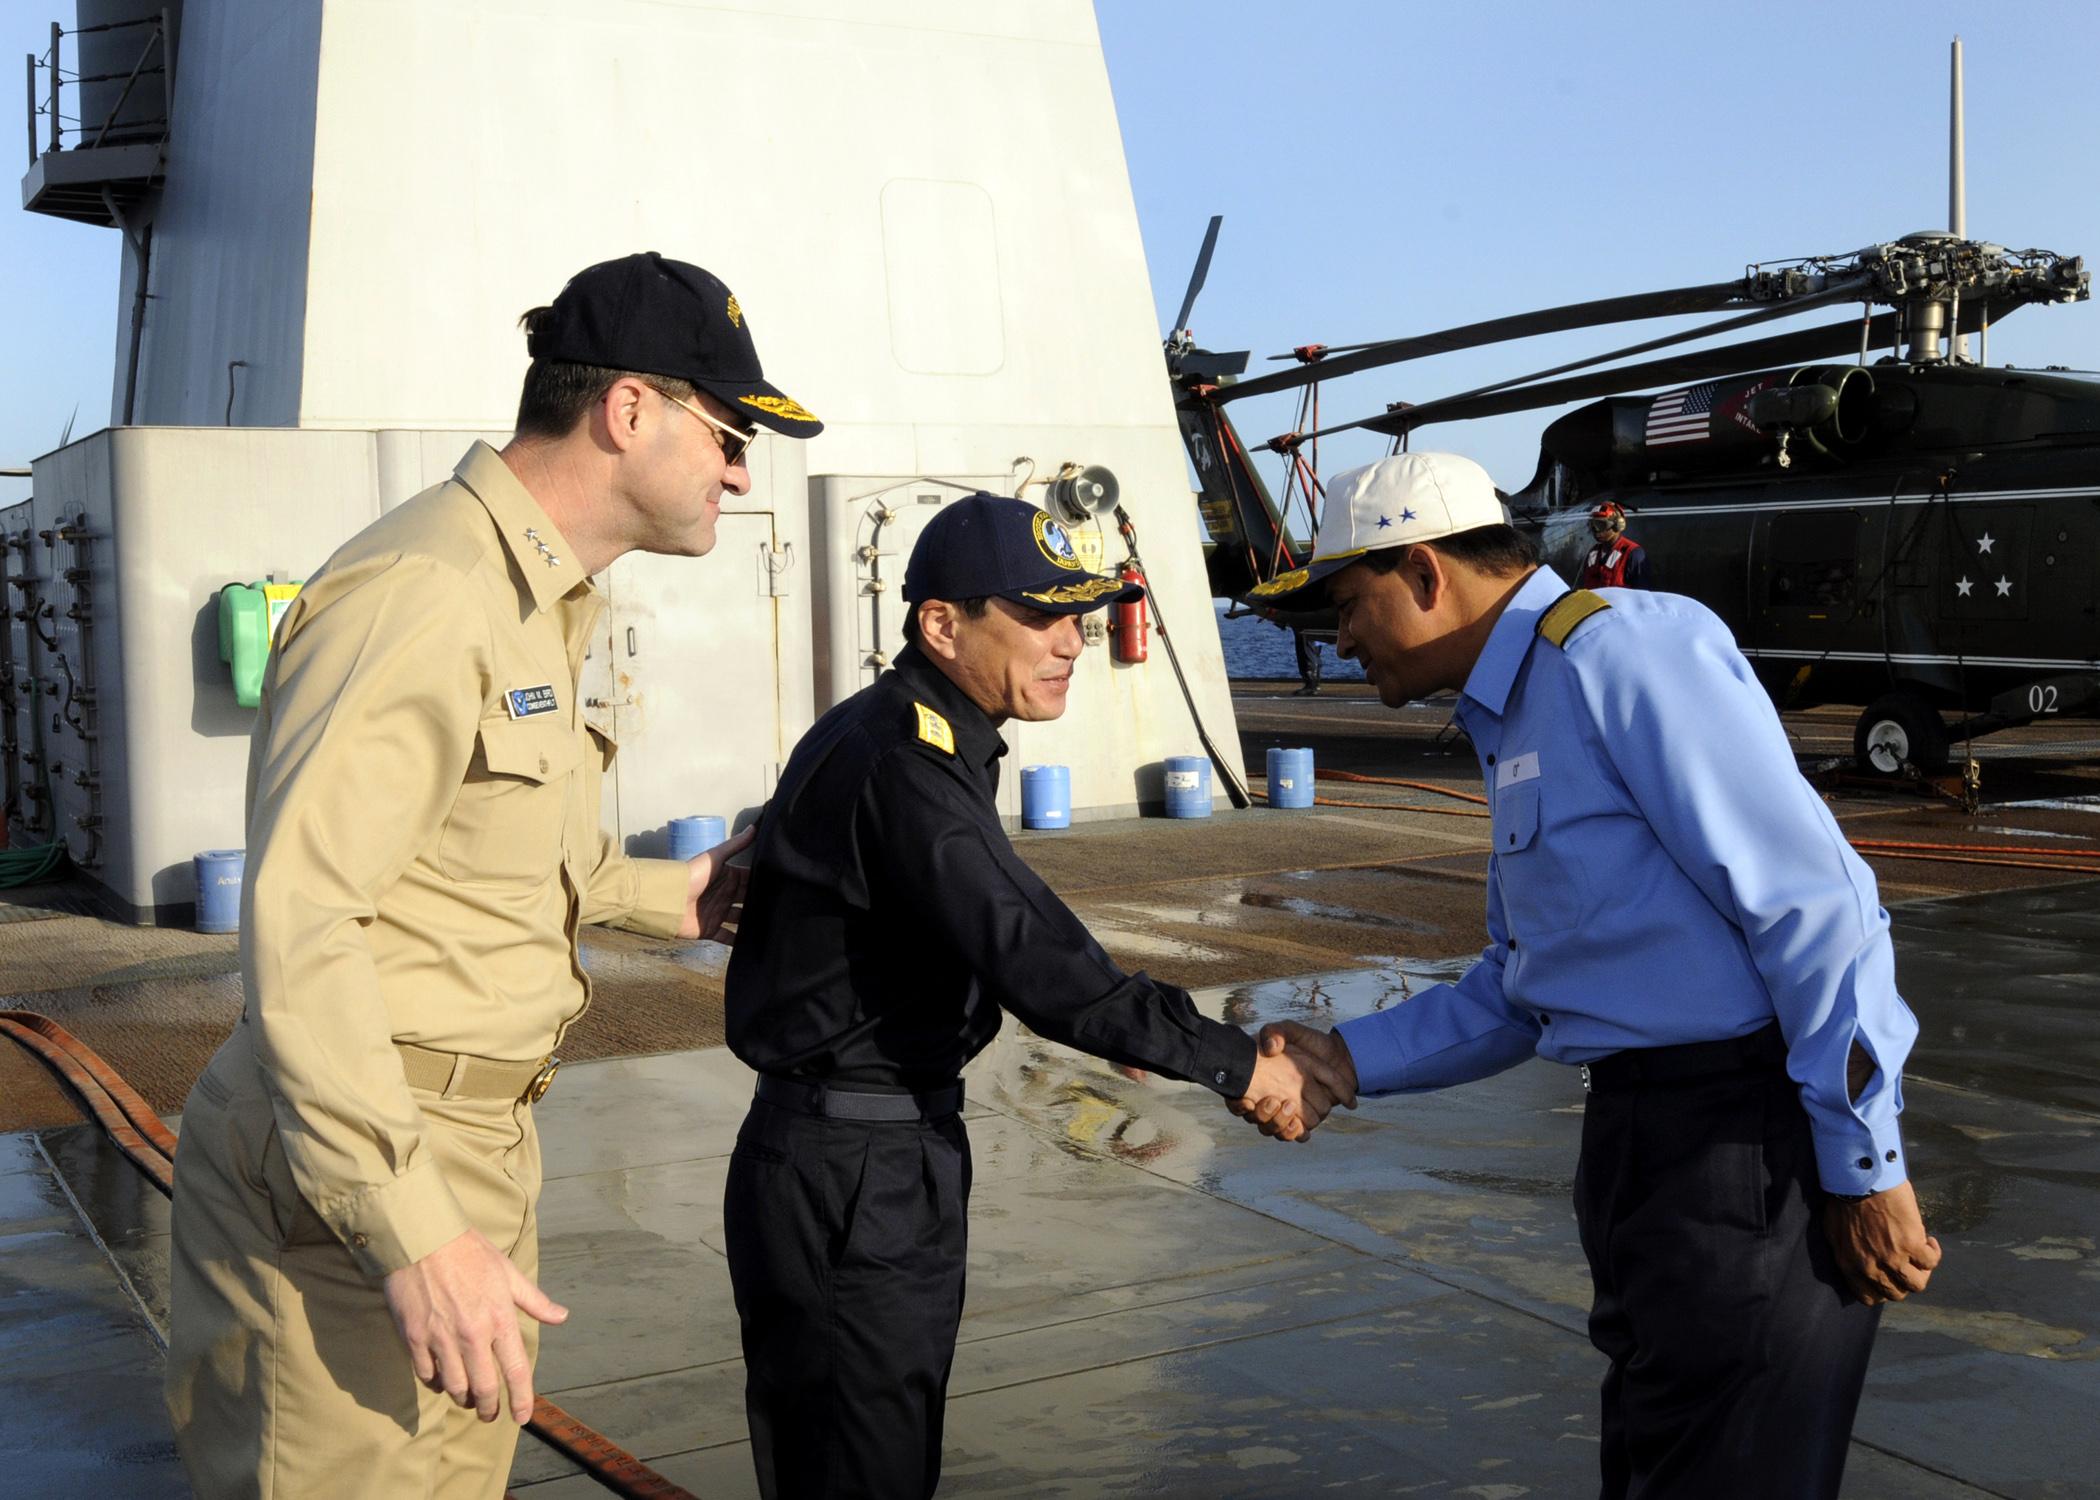 Fileus navy 090502 n 7280v 023 indian navy rear adm anurag g fileus navy 090502 n 7280v 023 indian navy rear adm m4hsunfo